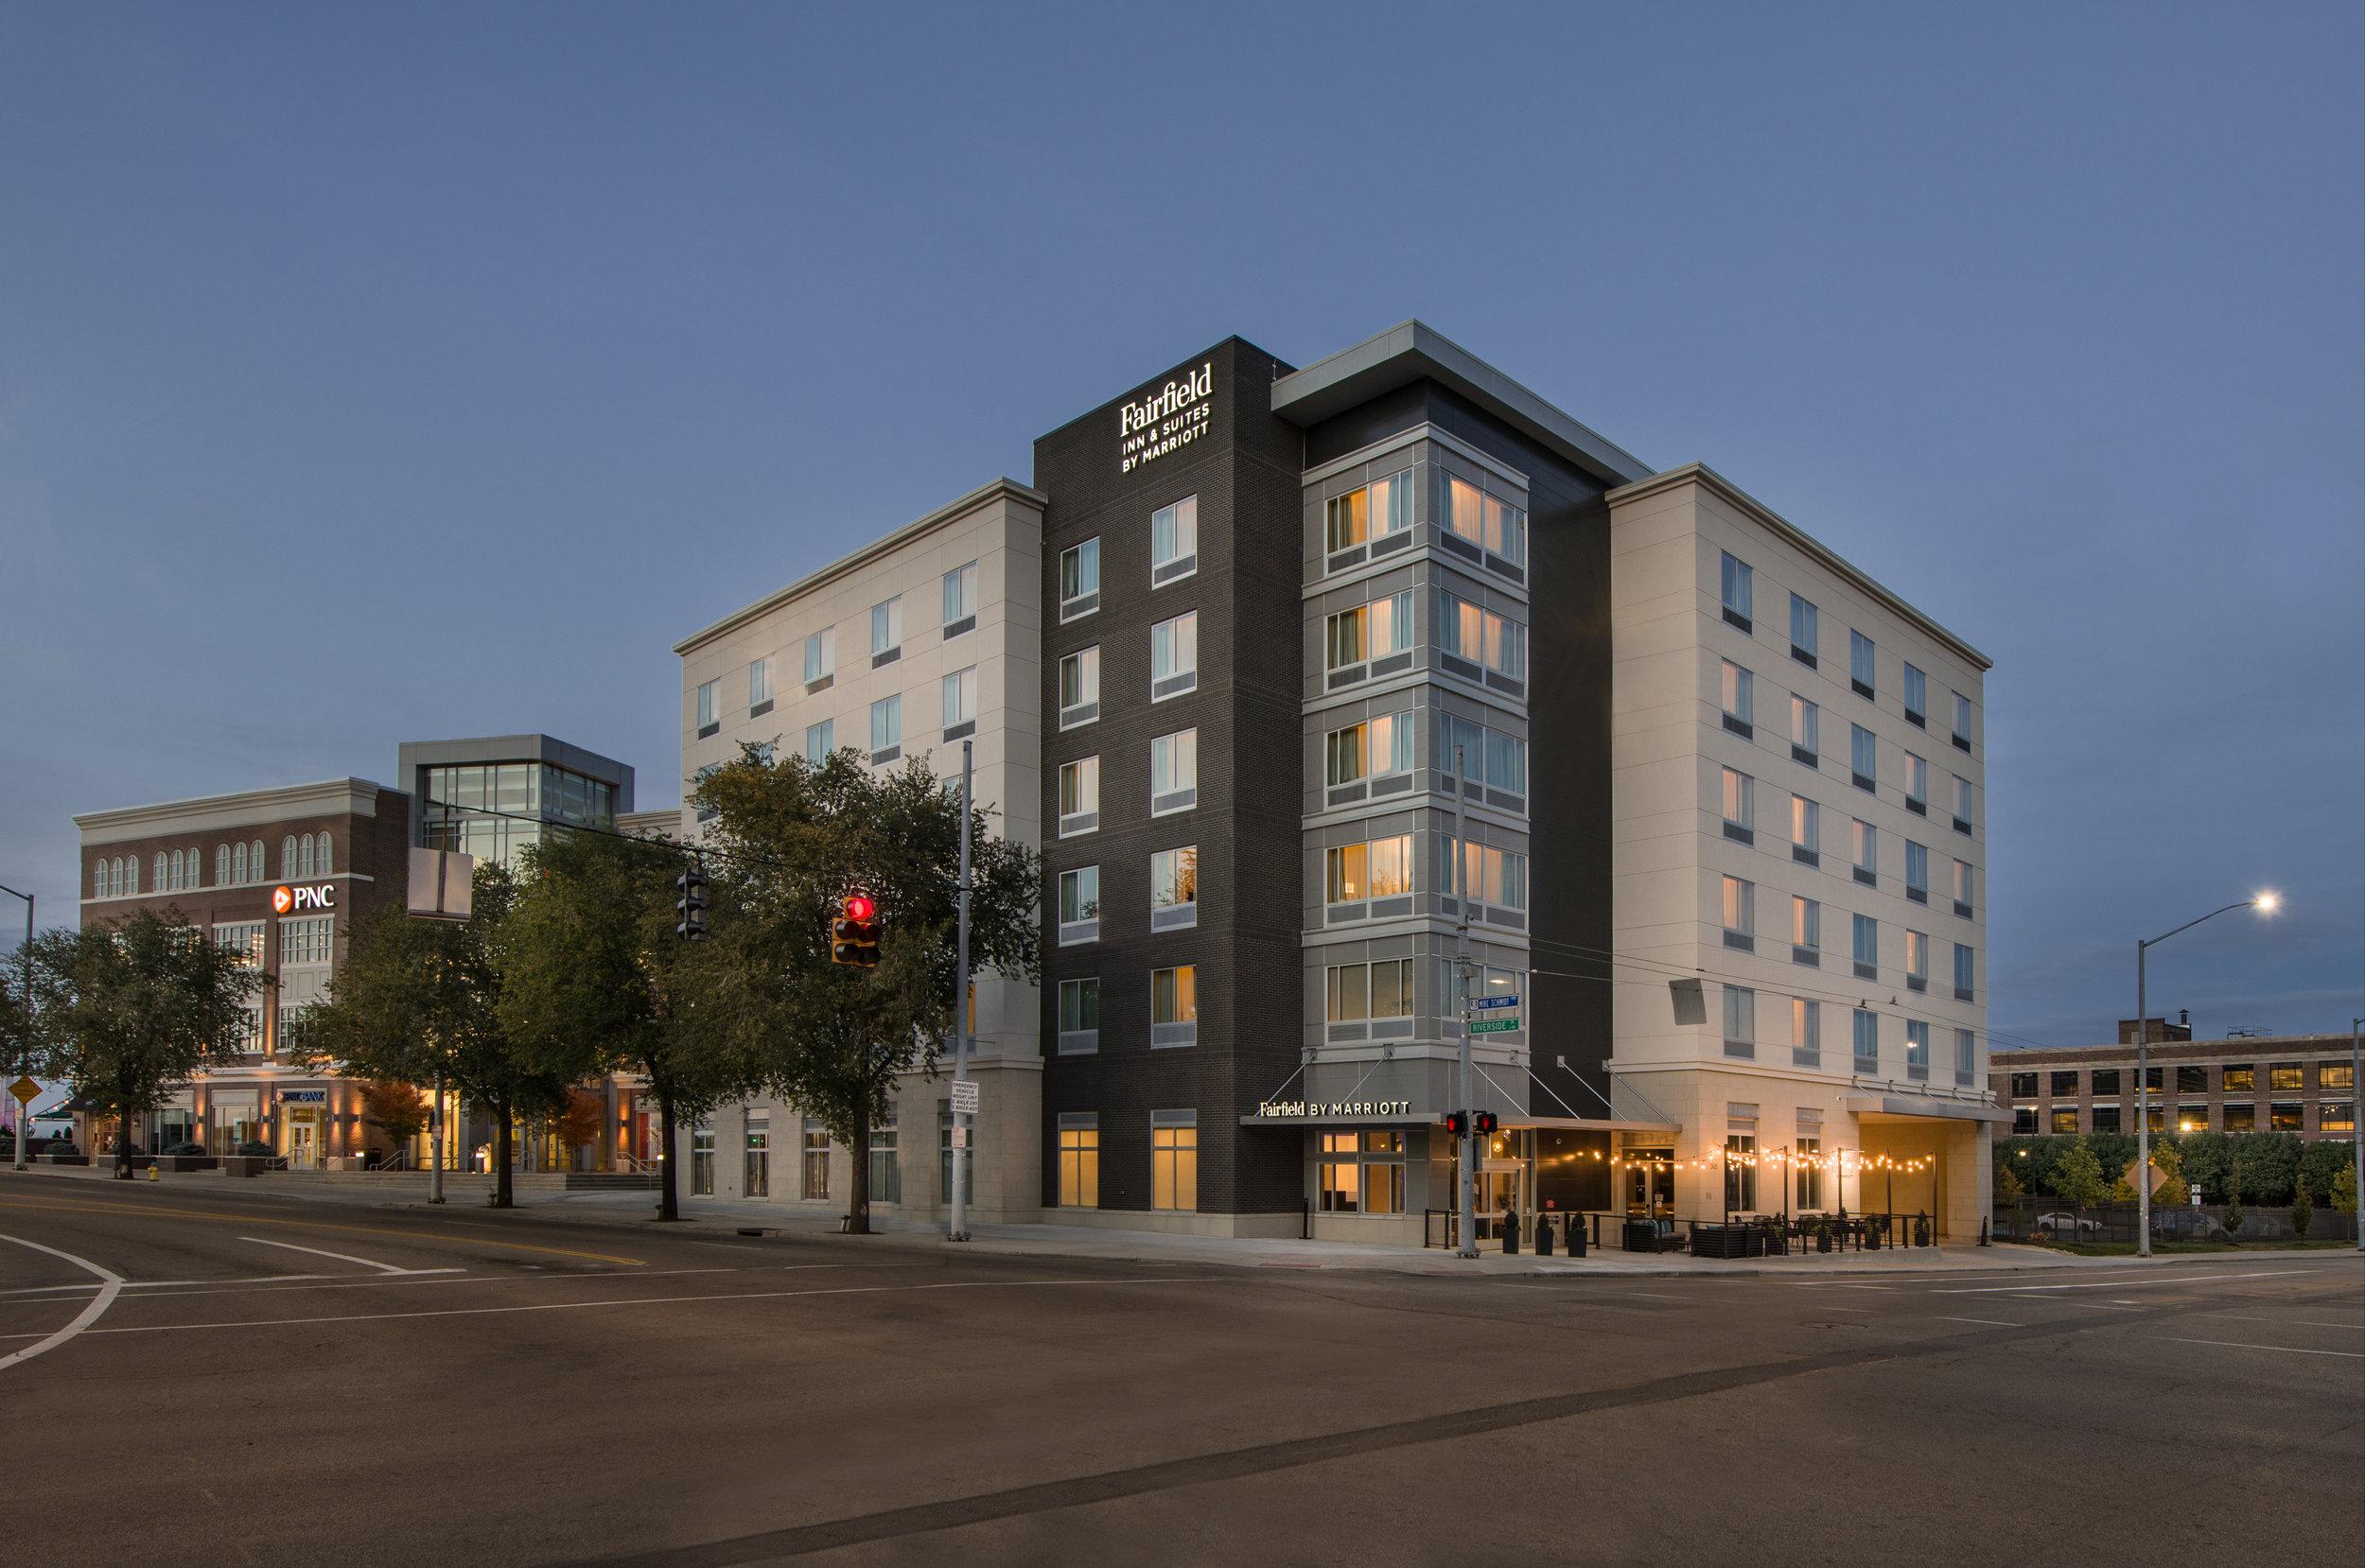 Fairfield Inn & Suites |  Dayton, OH